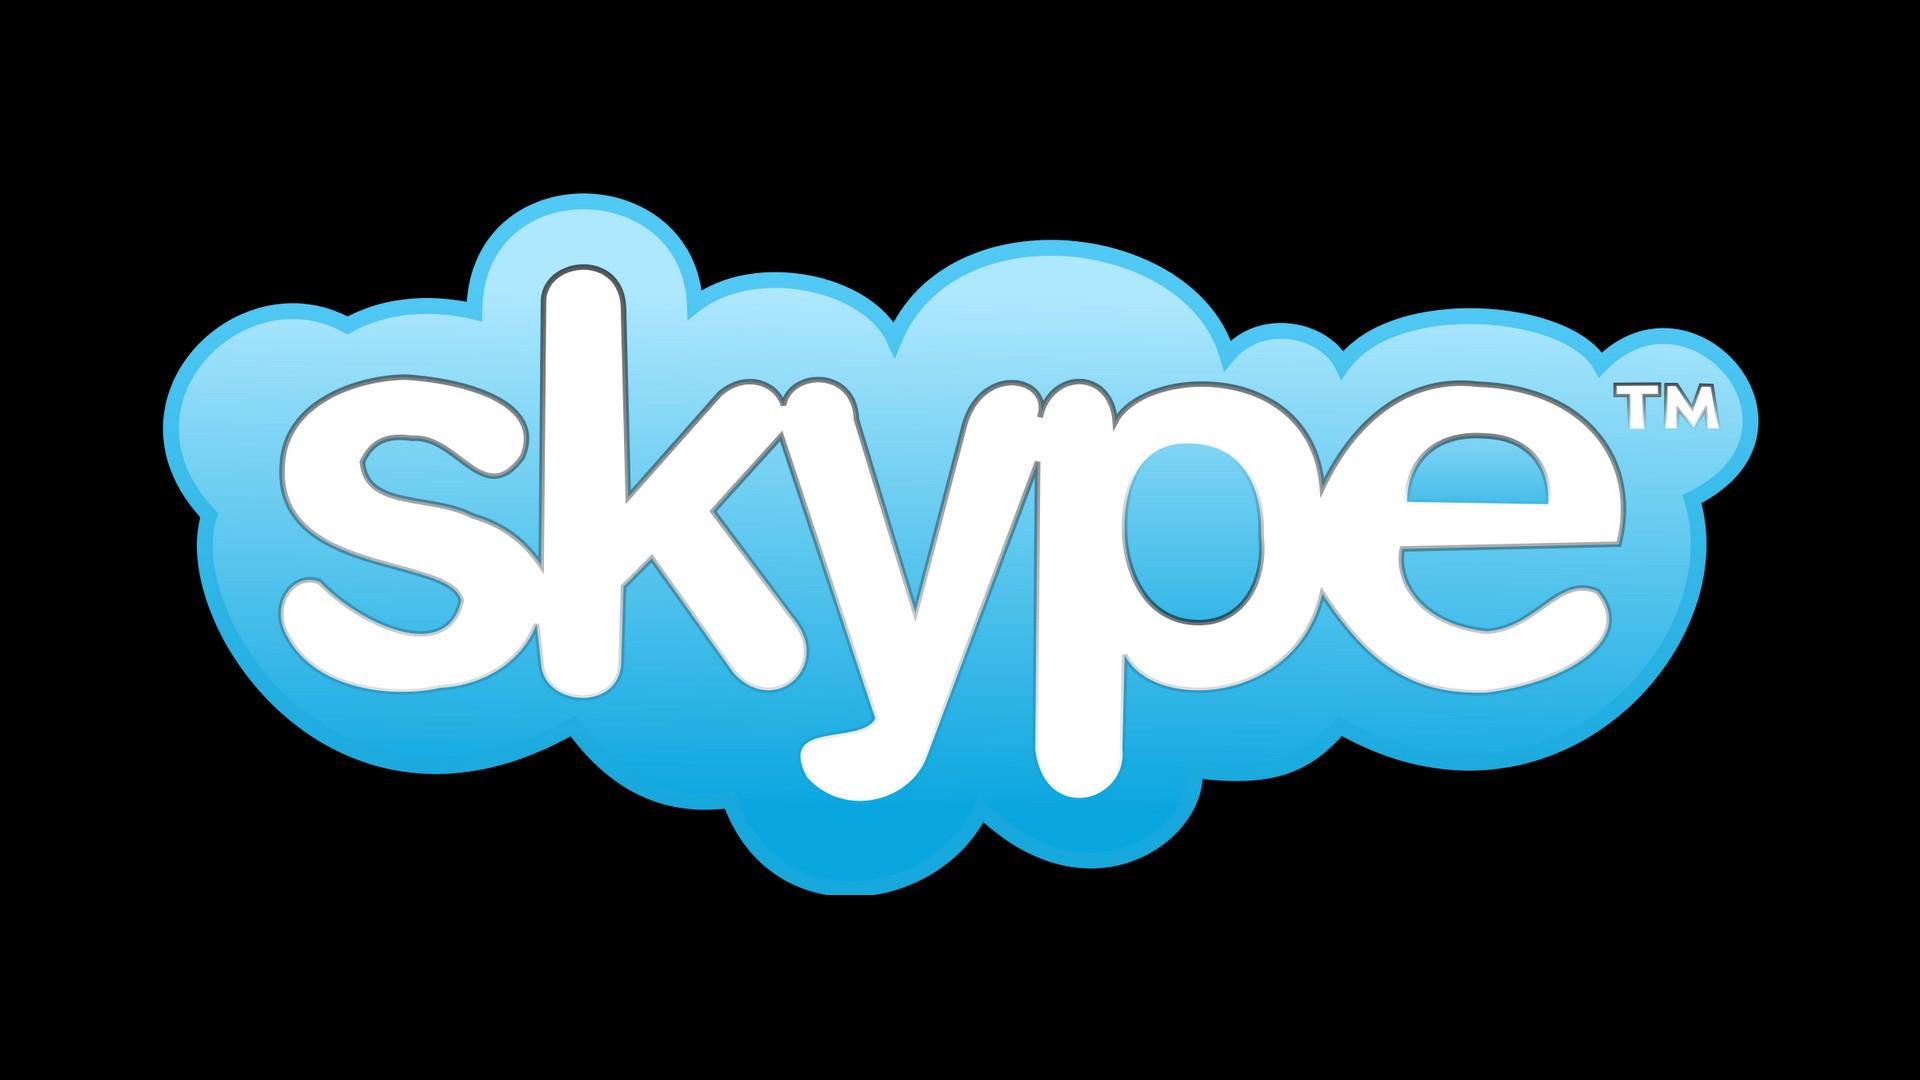 skype logo desktop wallpaper 62815